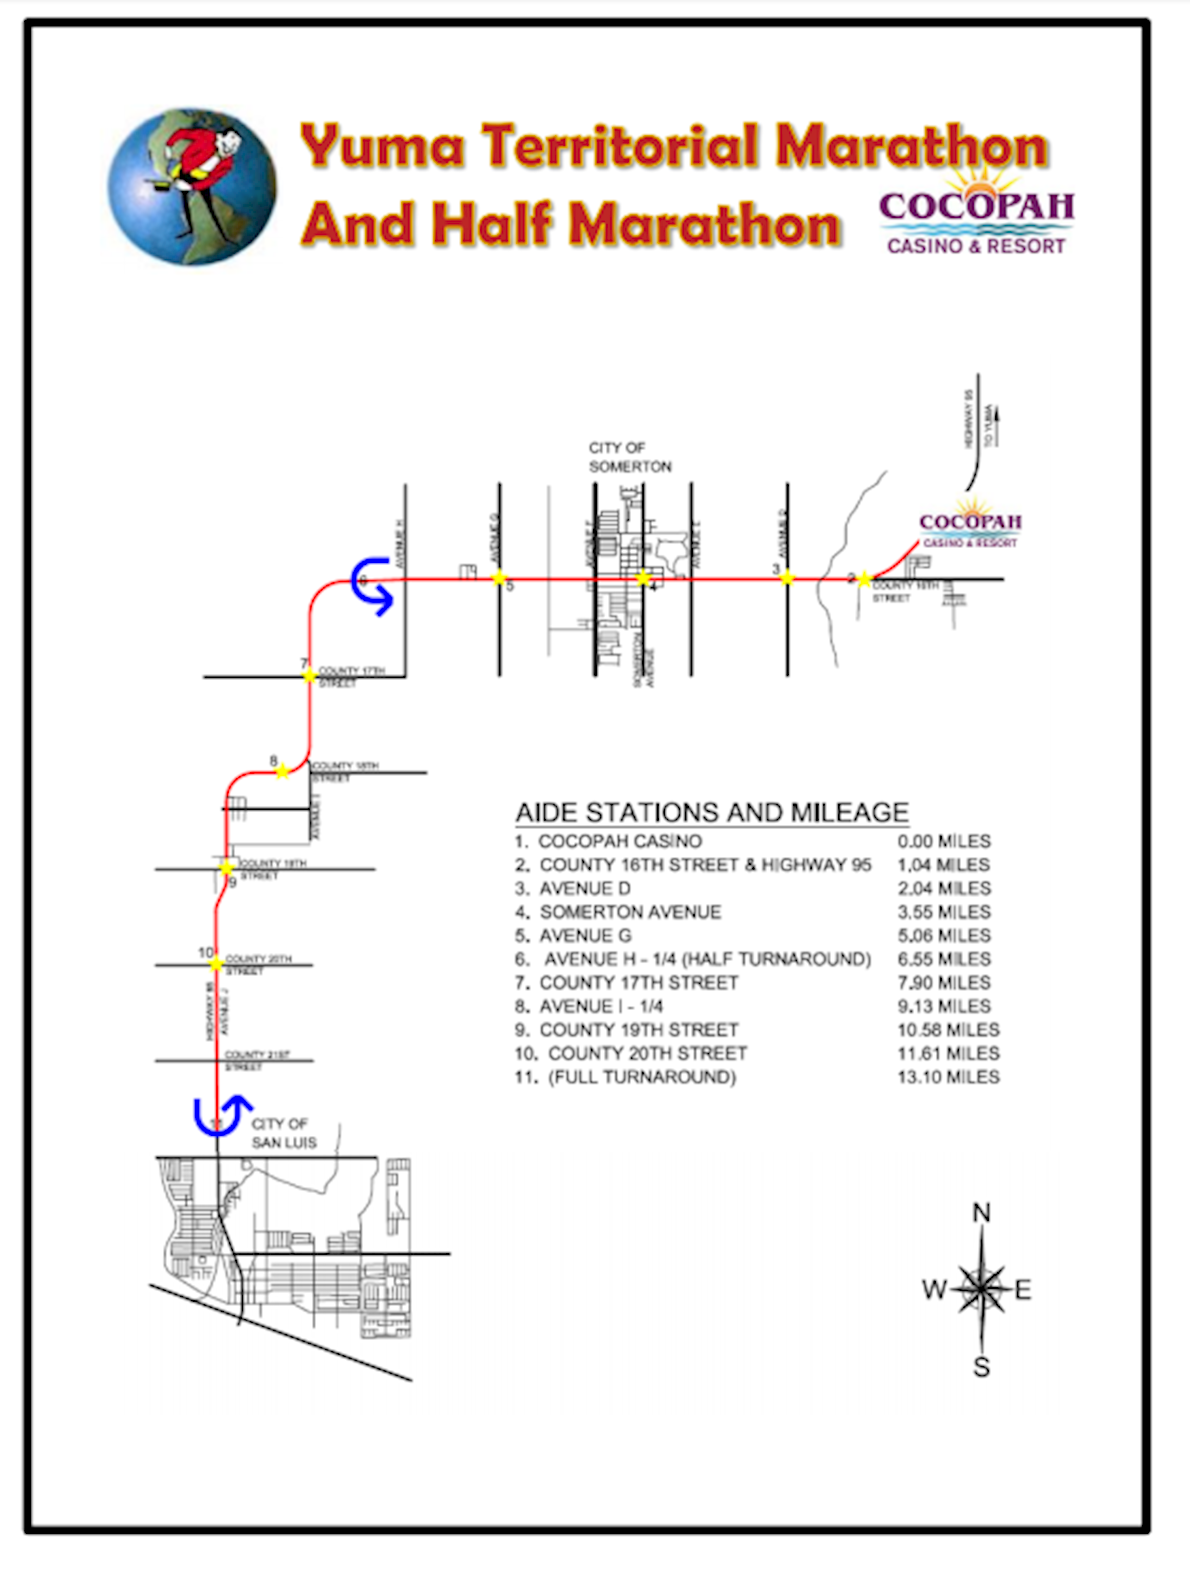 Yuma Territorial Marathon & Half Marathon 路线图